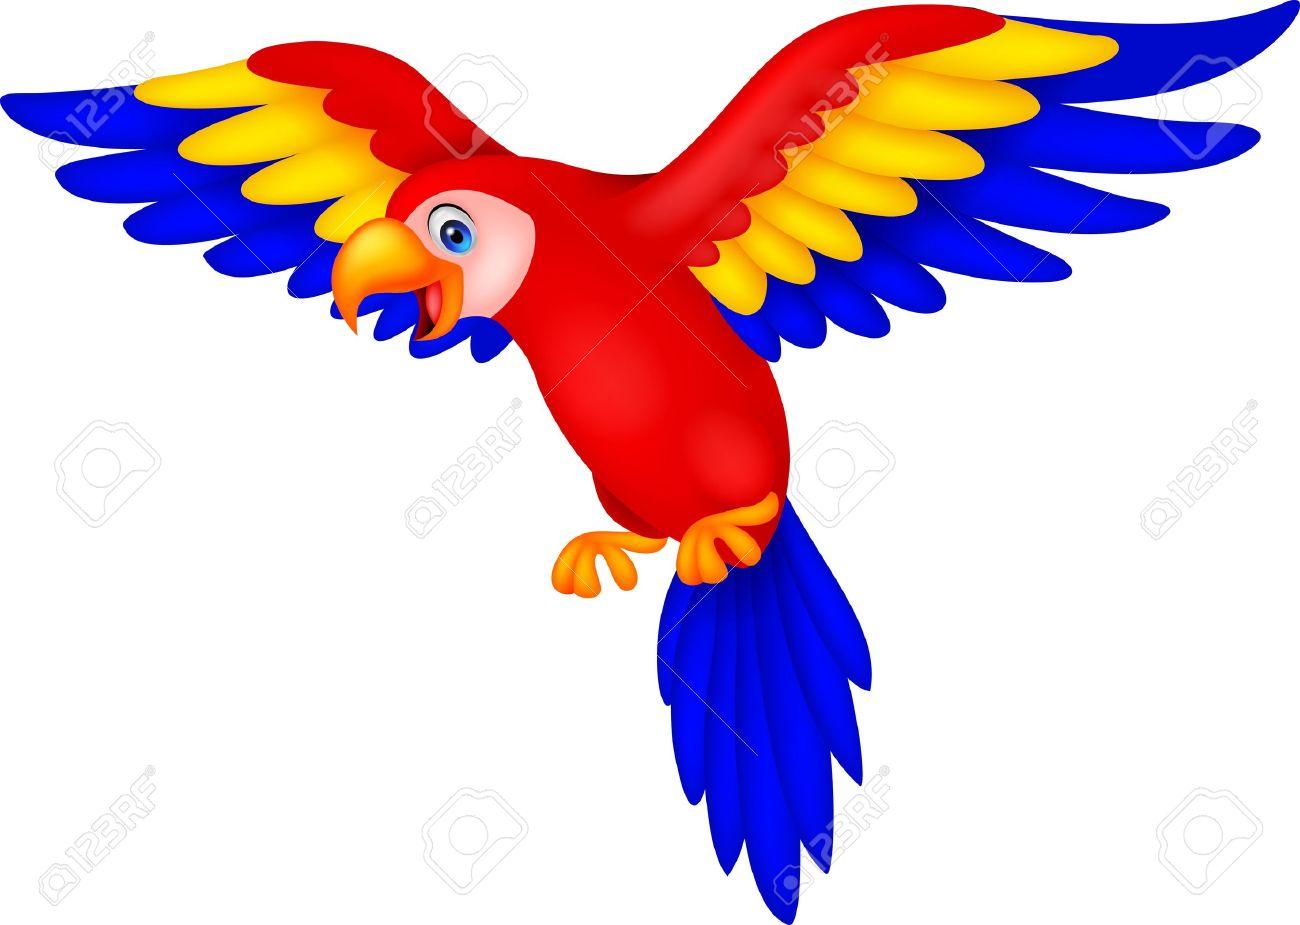 Parrot flying clipart vector transparent download Fly Parrot | Free download best Fly Parrot on ClipArtMag.com vector transparent download